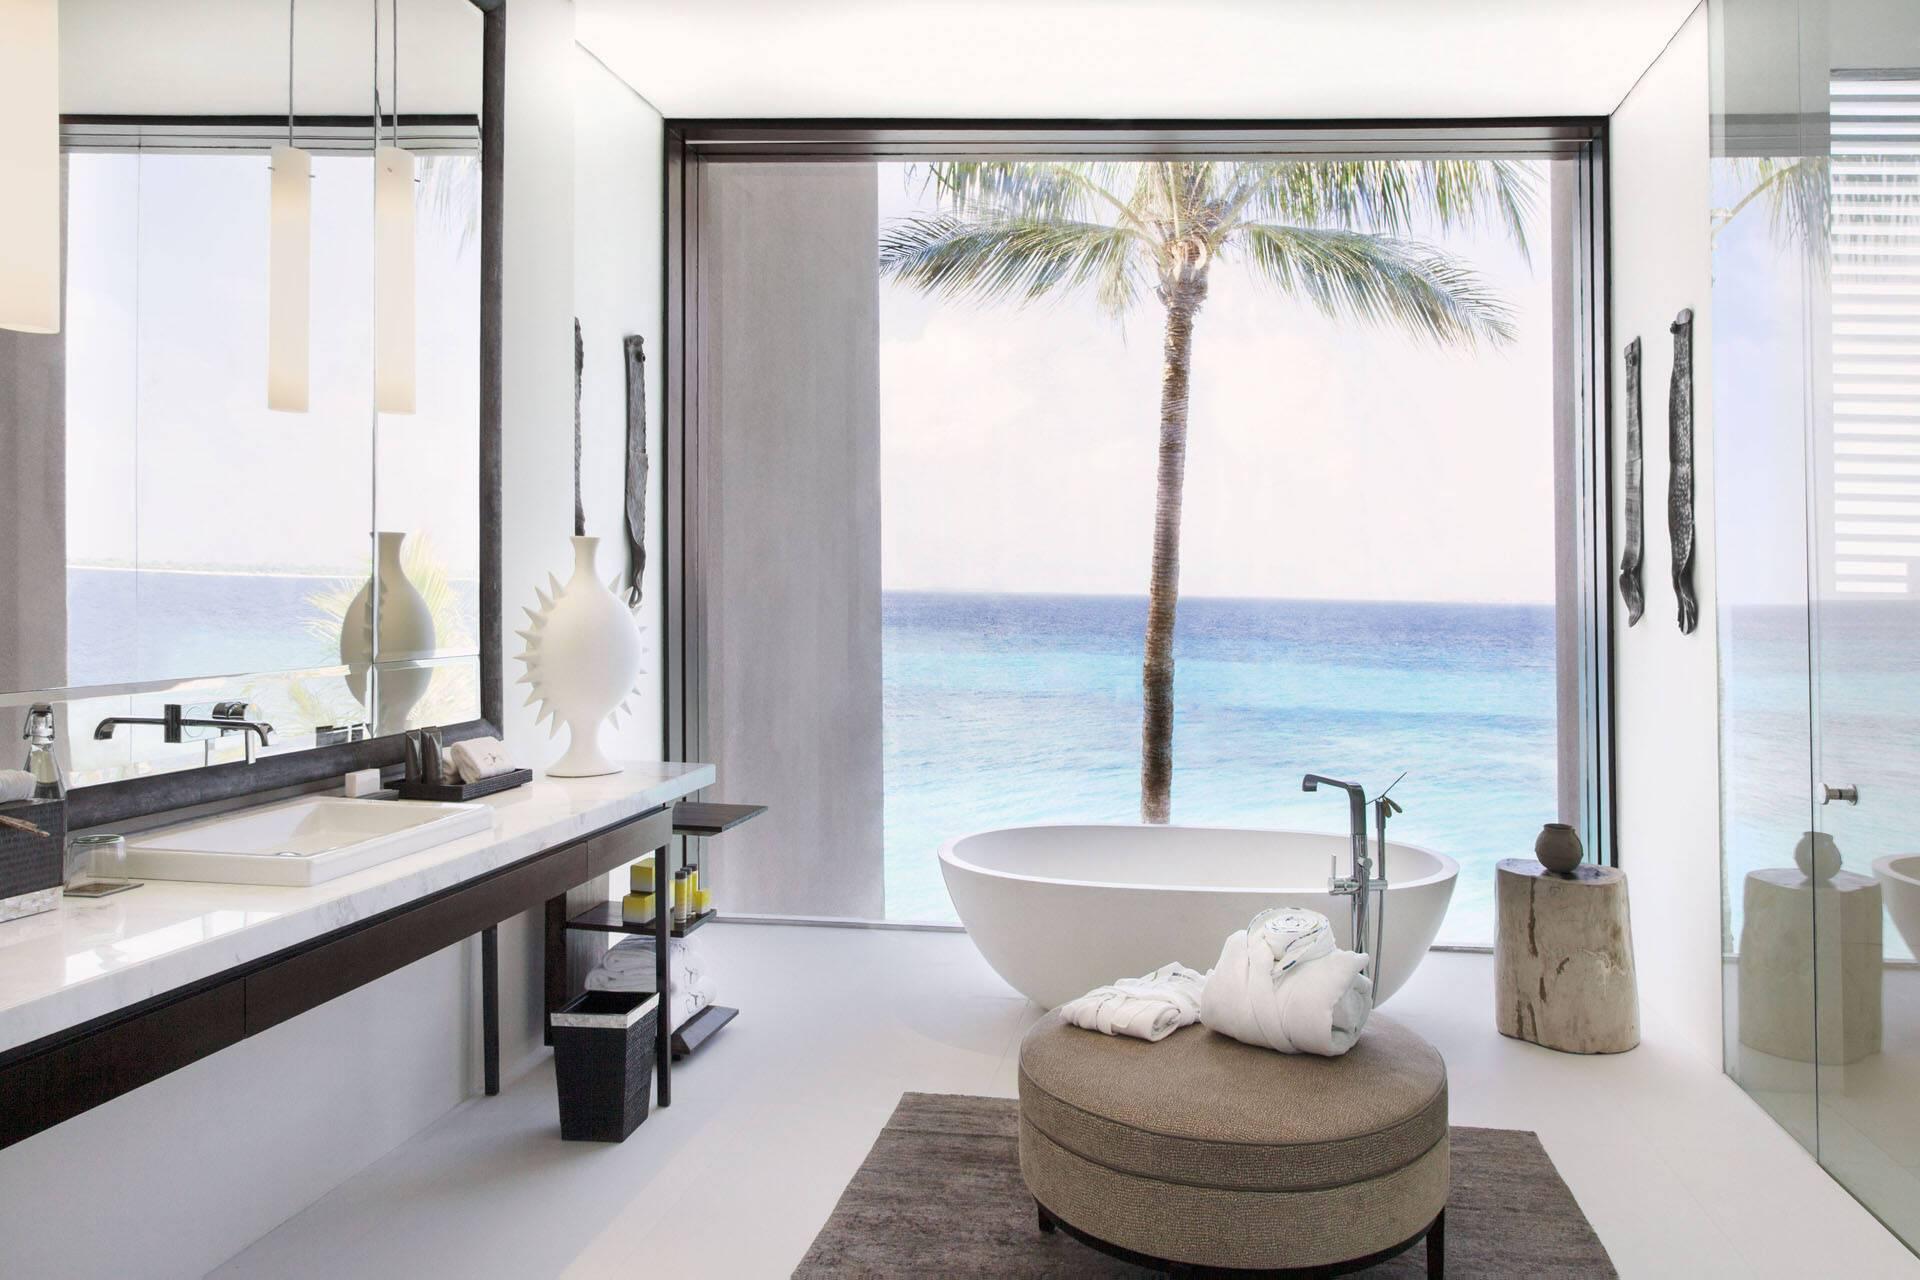 Cheval Blanc Randheli Maldives Private Island Salle Bains P Parinejad